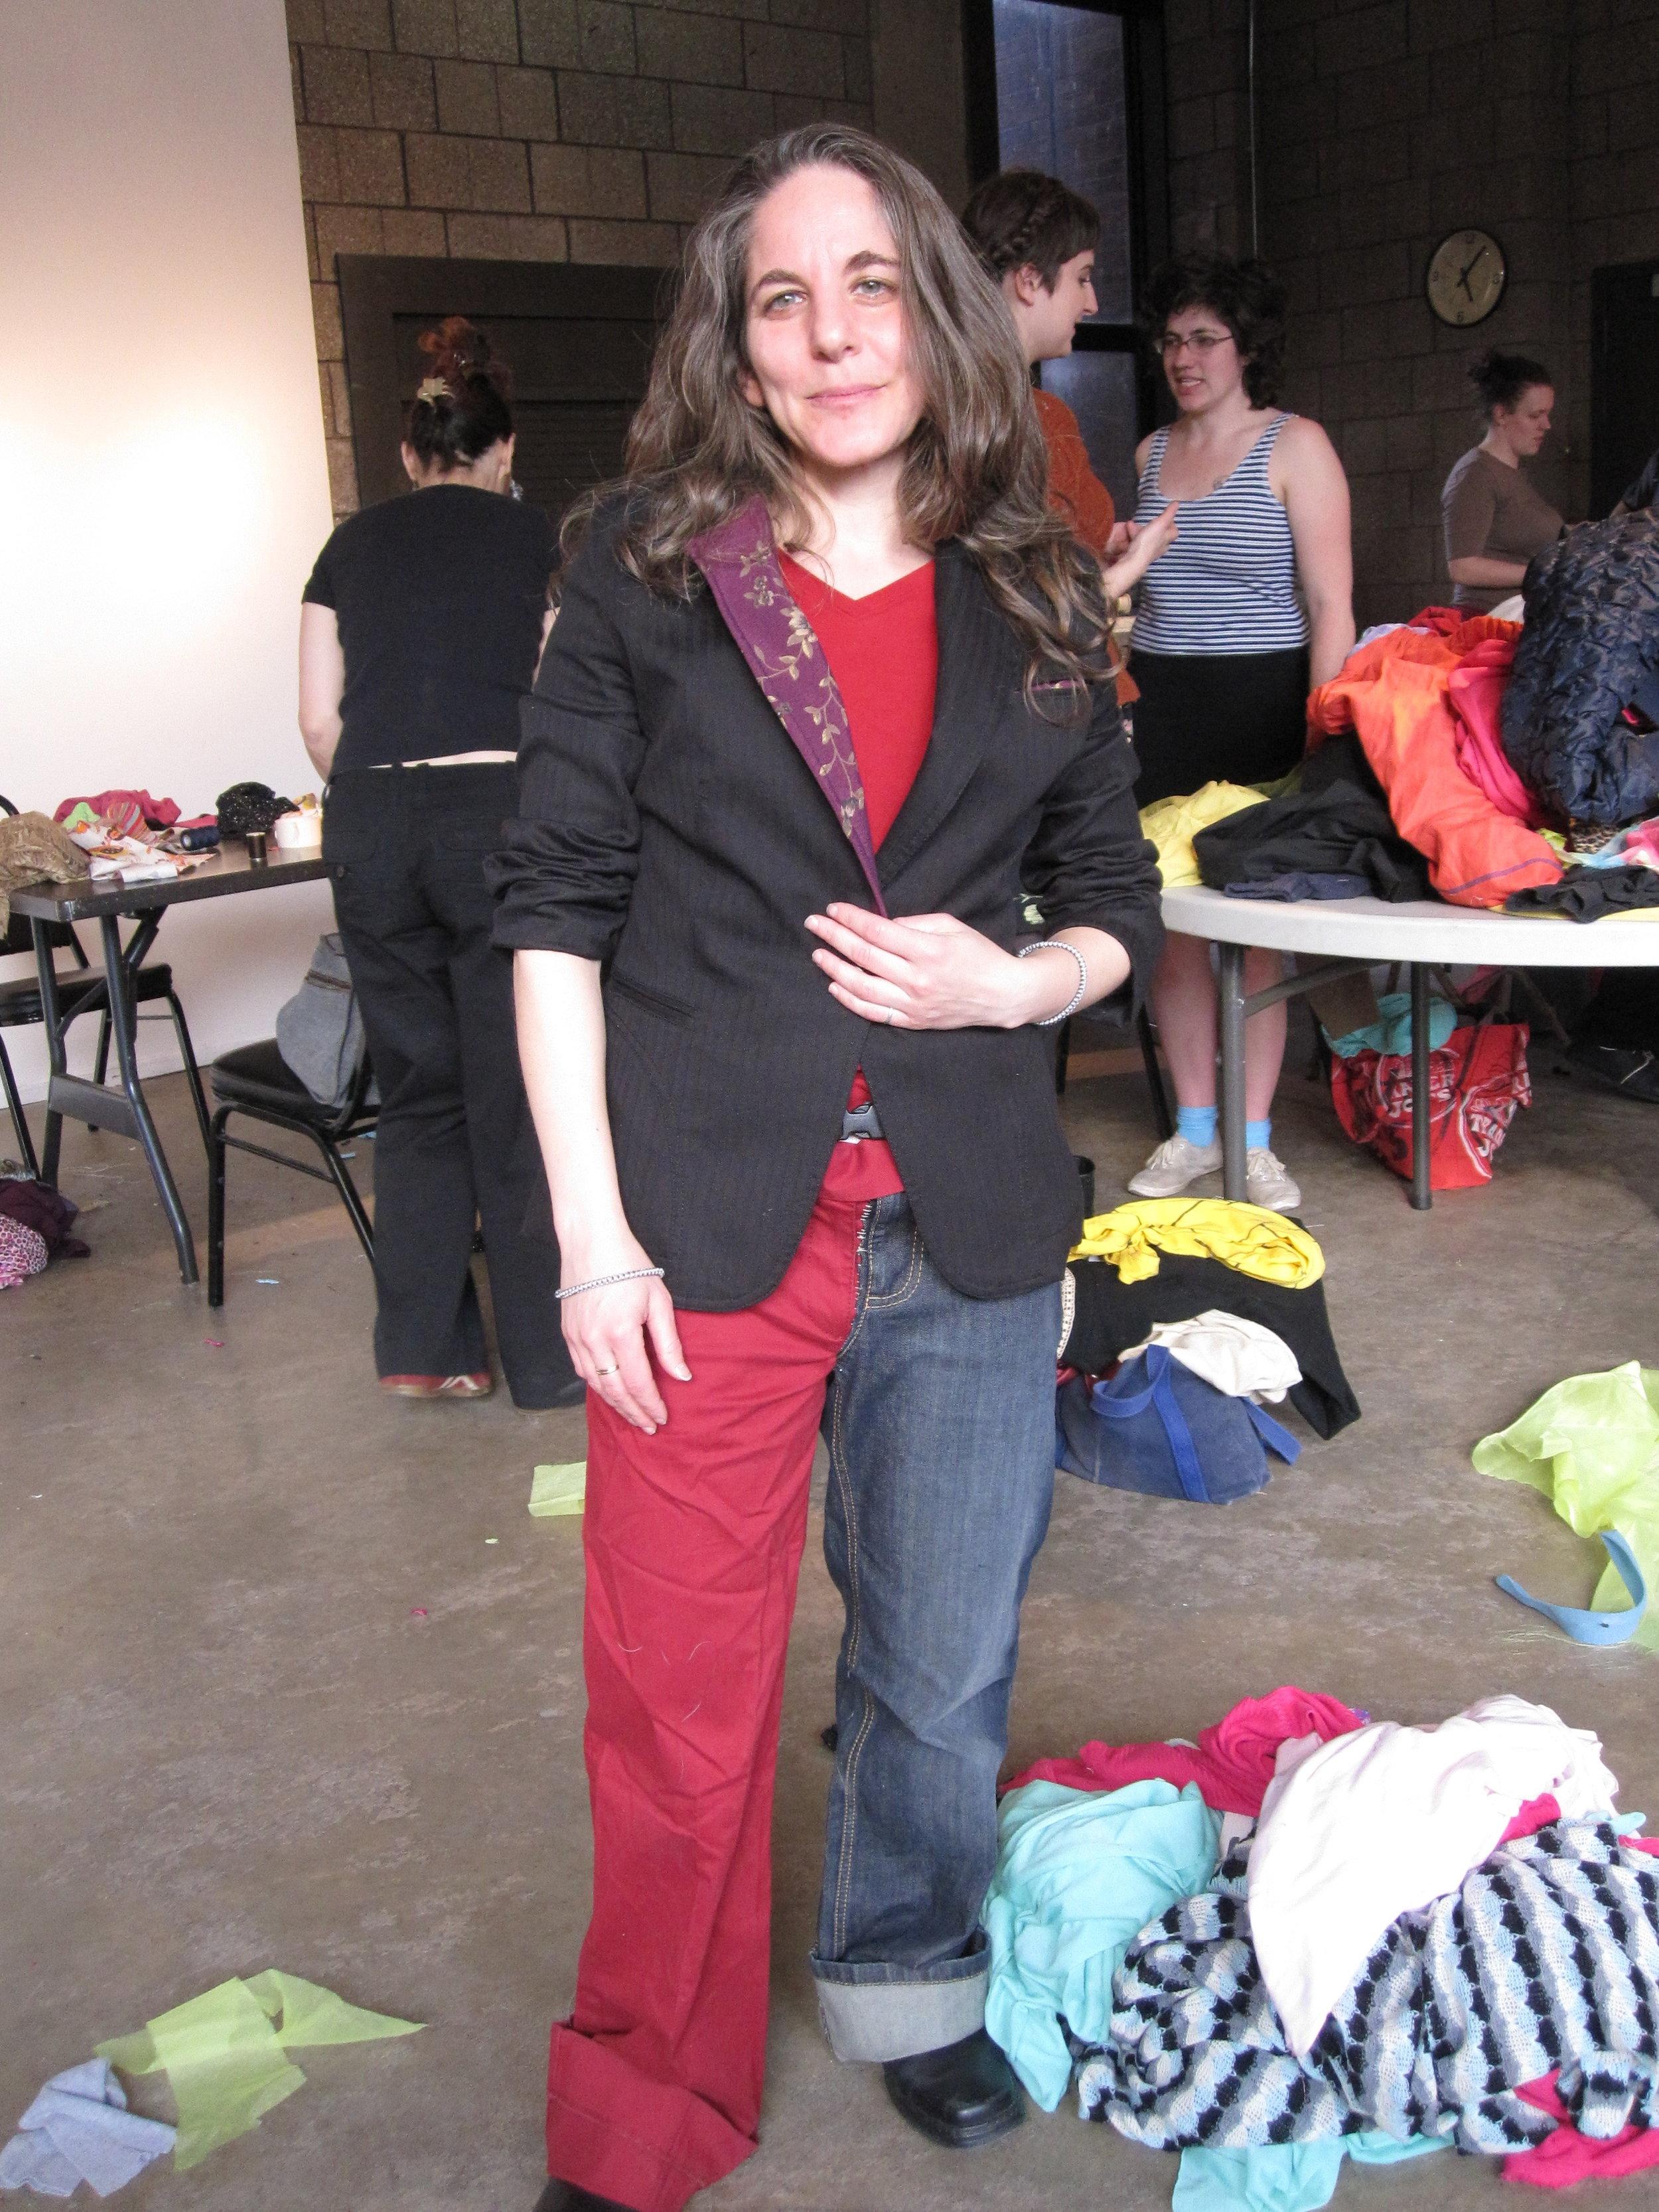 clothing-remake-marathon_4460304488_o.jpg